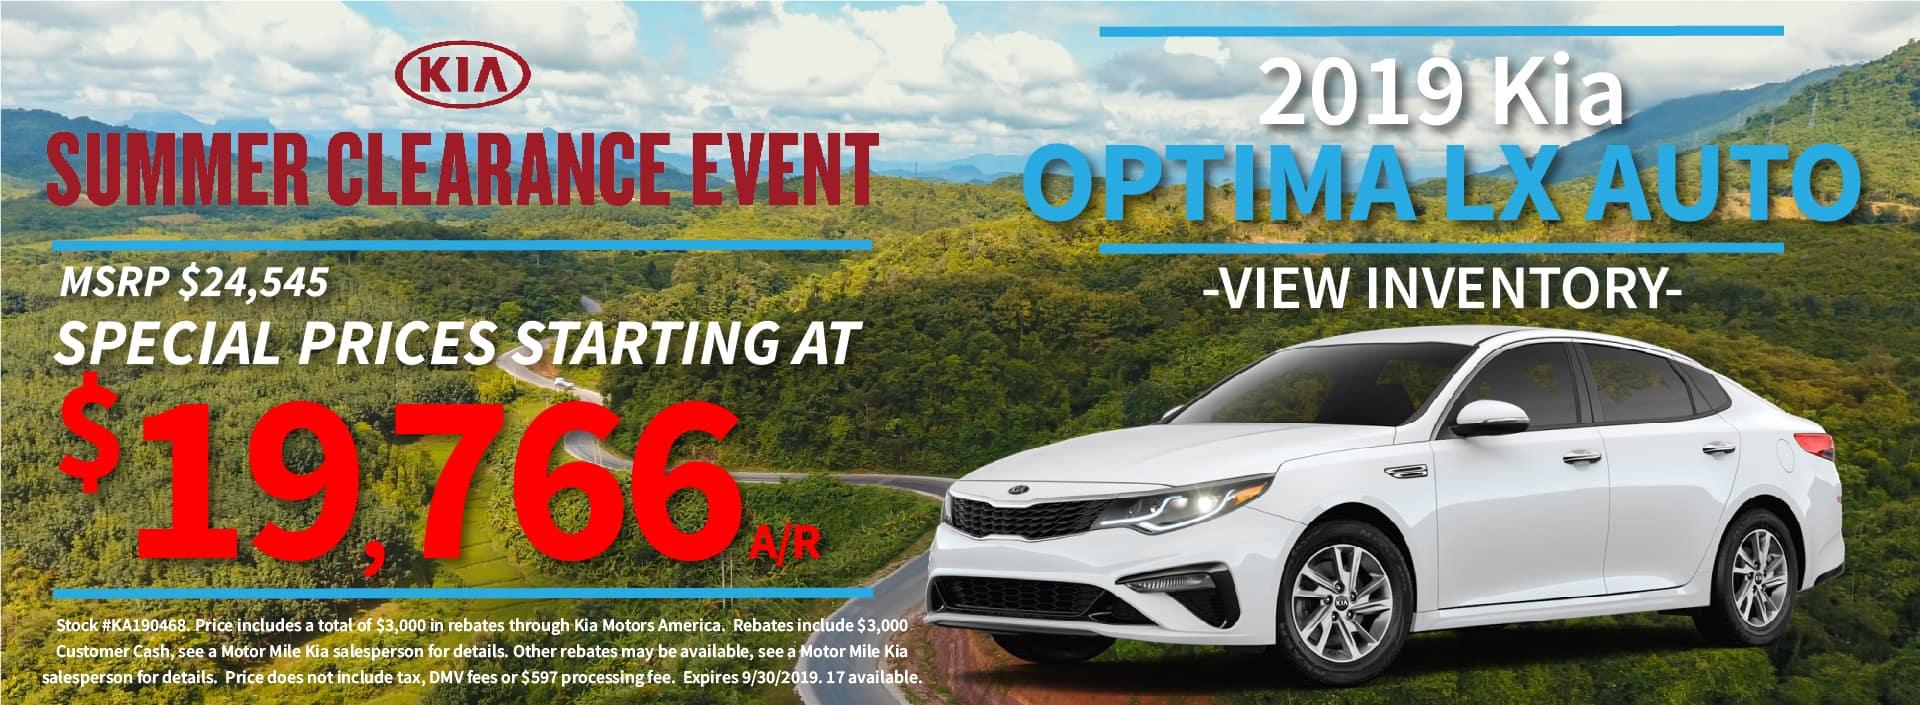 Motor Mile Kia   Auto Dealer and Service Center in